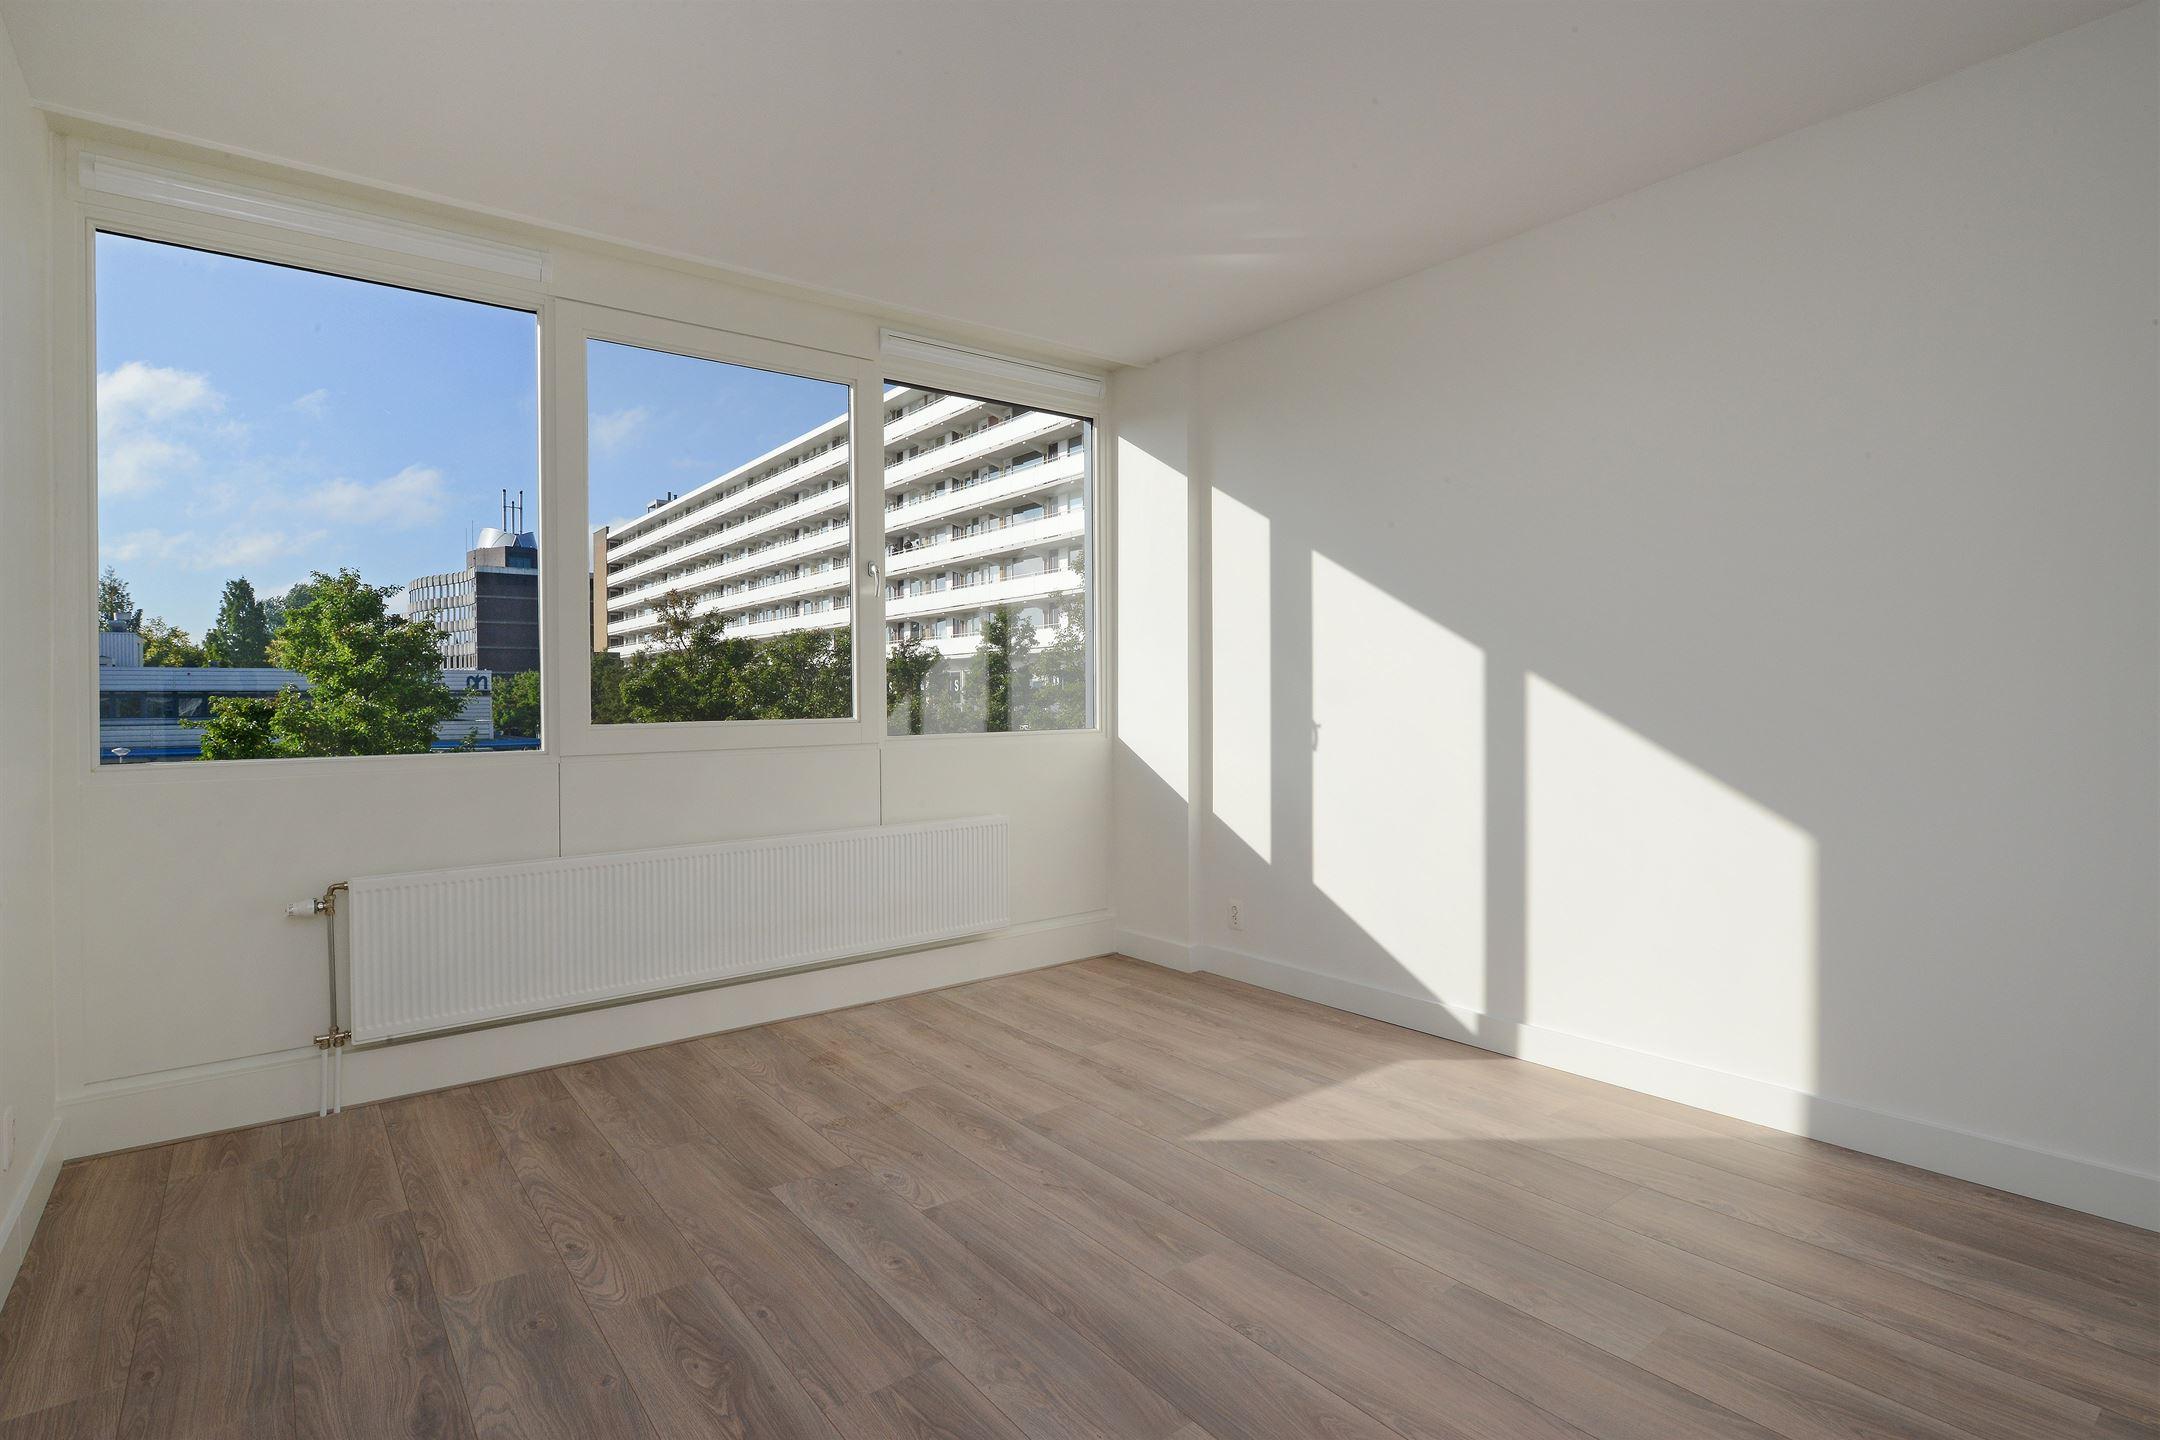 verhuurd rijswijkstraat 151 a 1062 es amsterdam funda. Black Bedroom Furniture Sets. Home Design Ideas